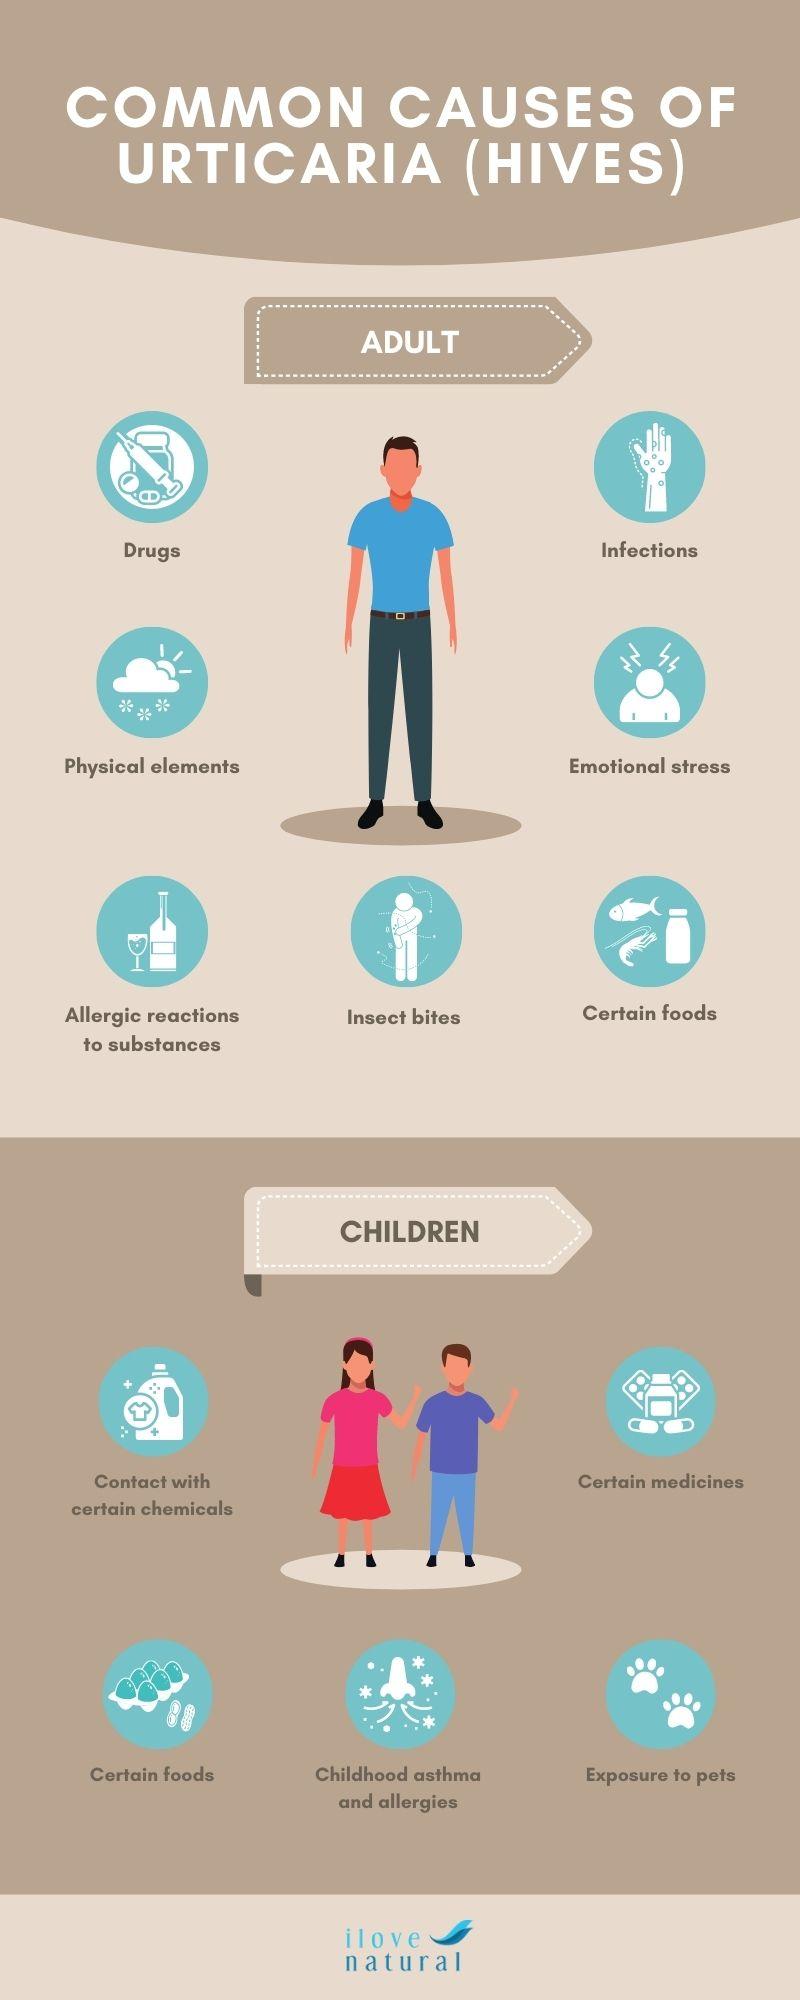 Common Causes of Urticaria (Hives) |ilovenatural.store